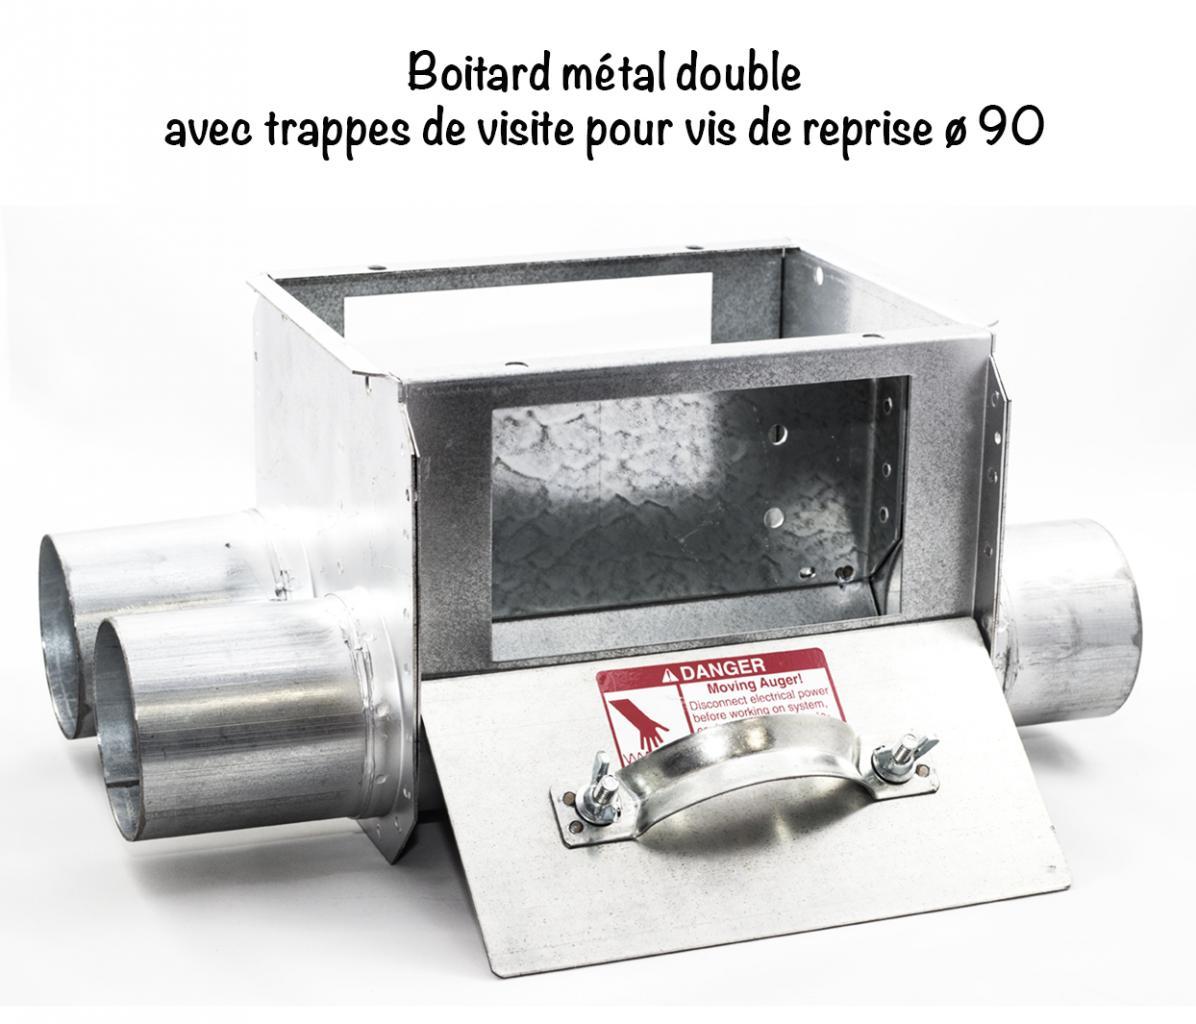 BOITARD METAL